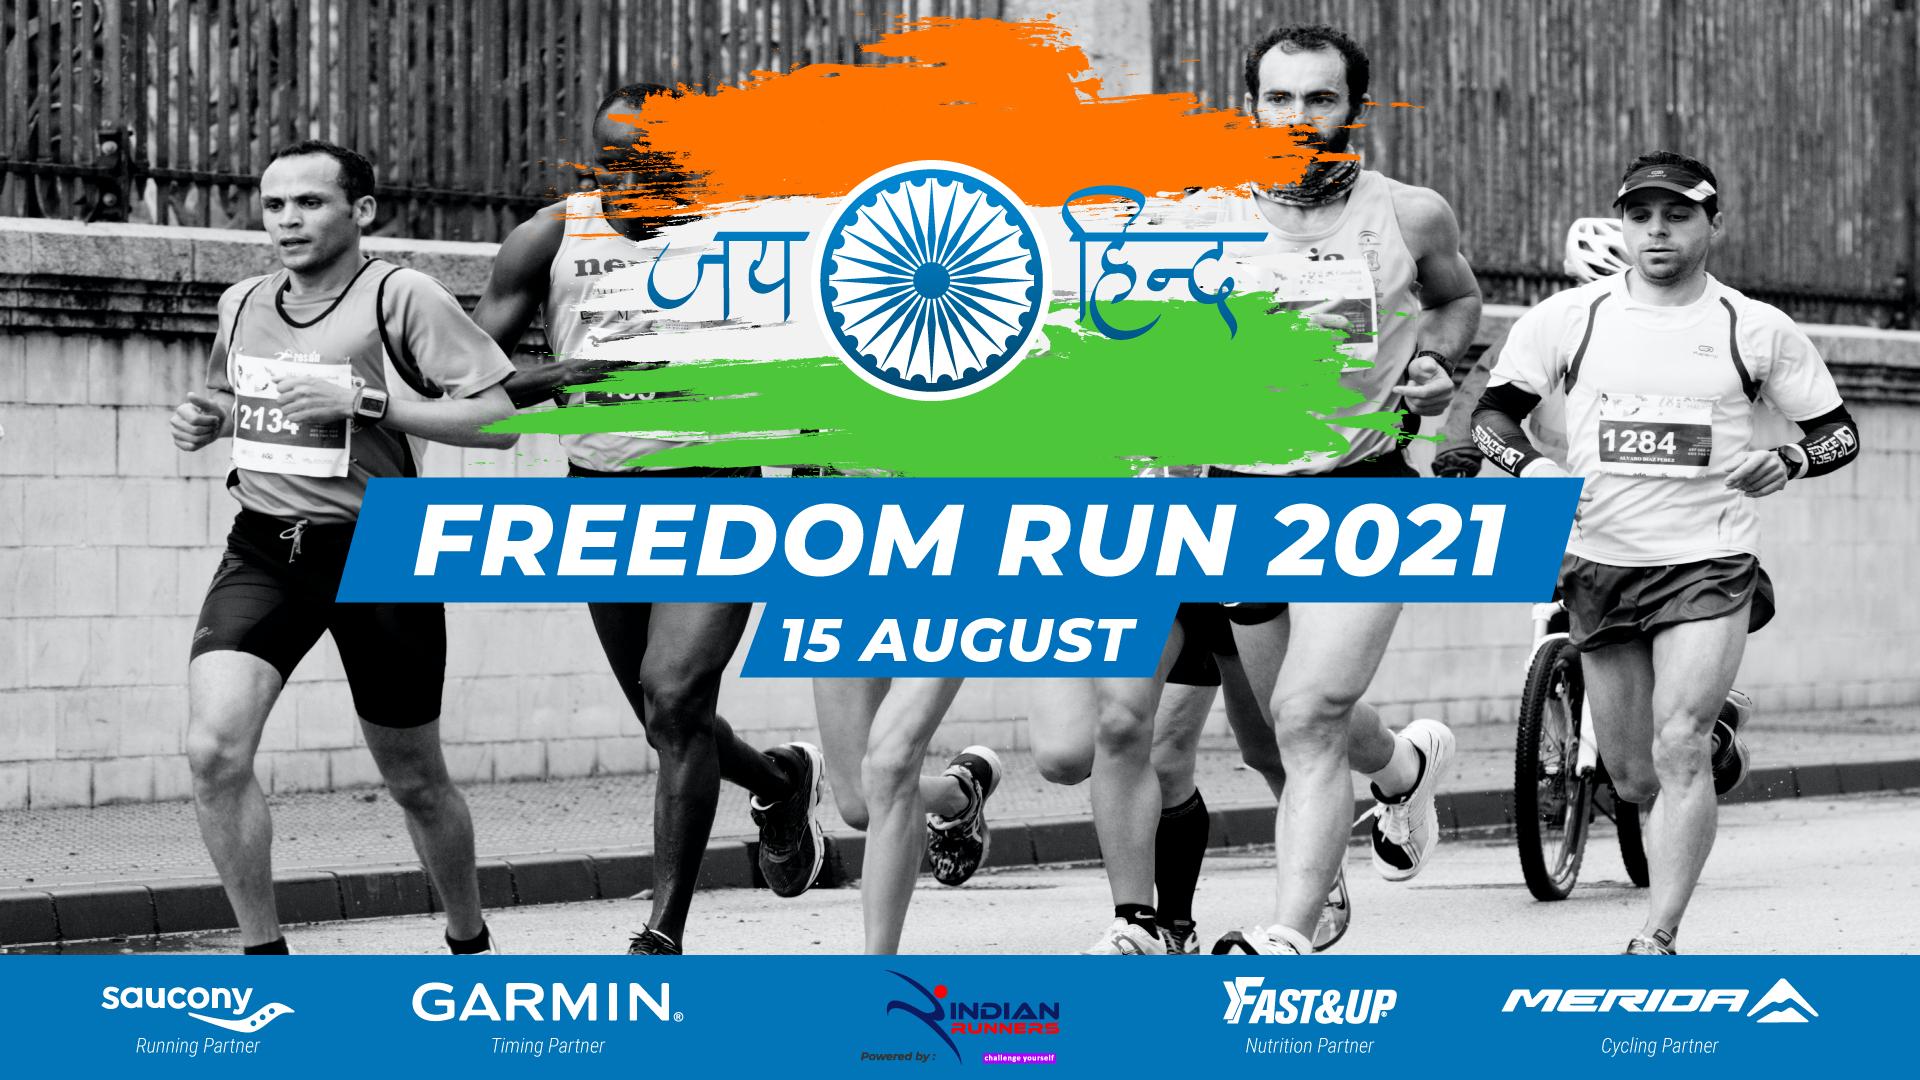 Freedom Run 2021 image